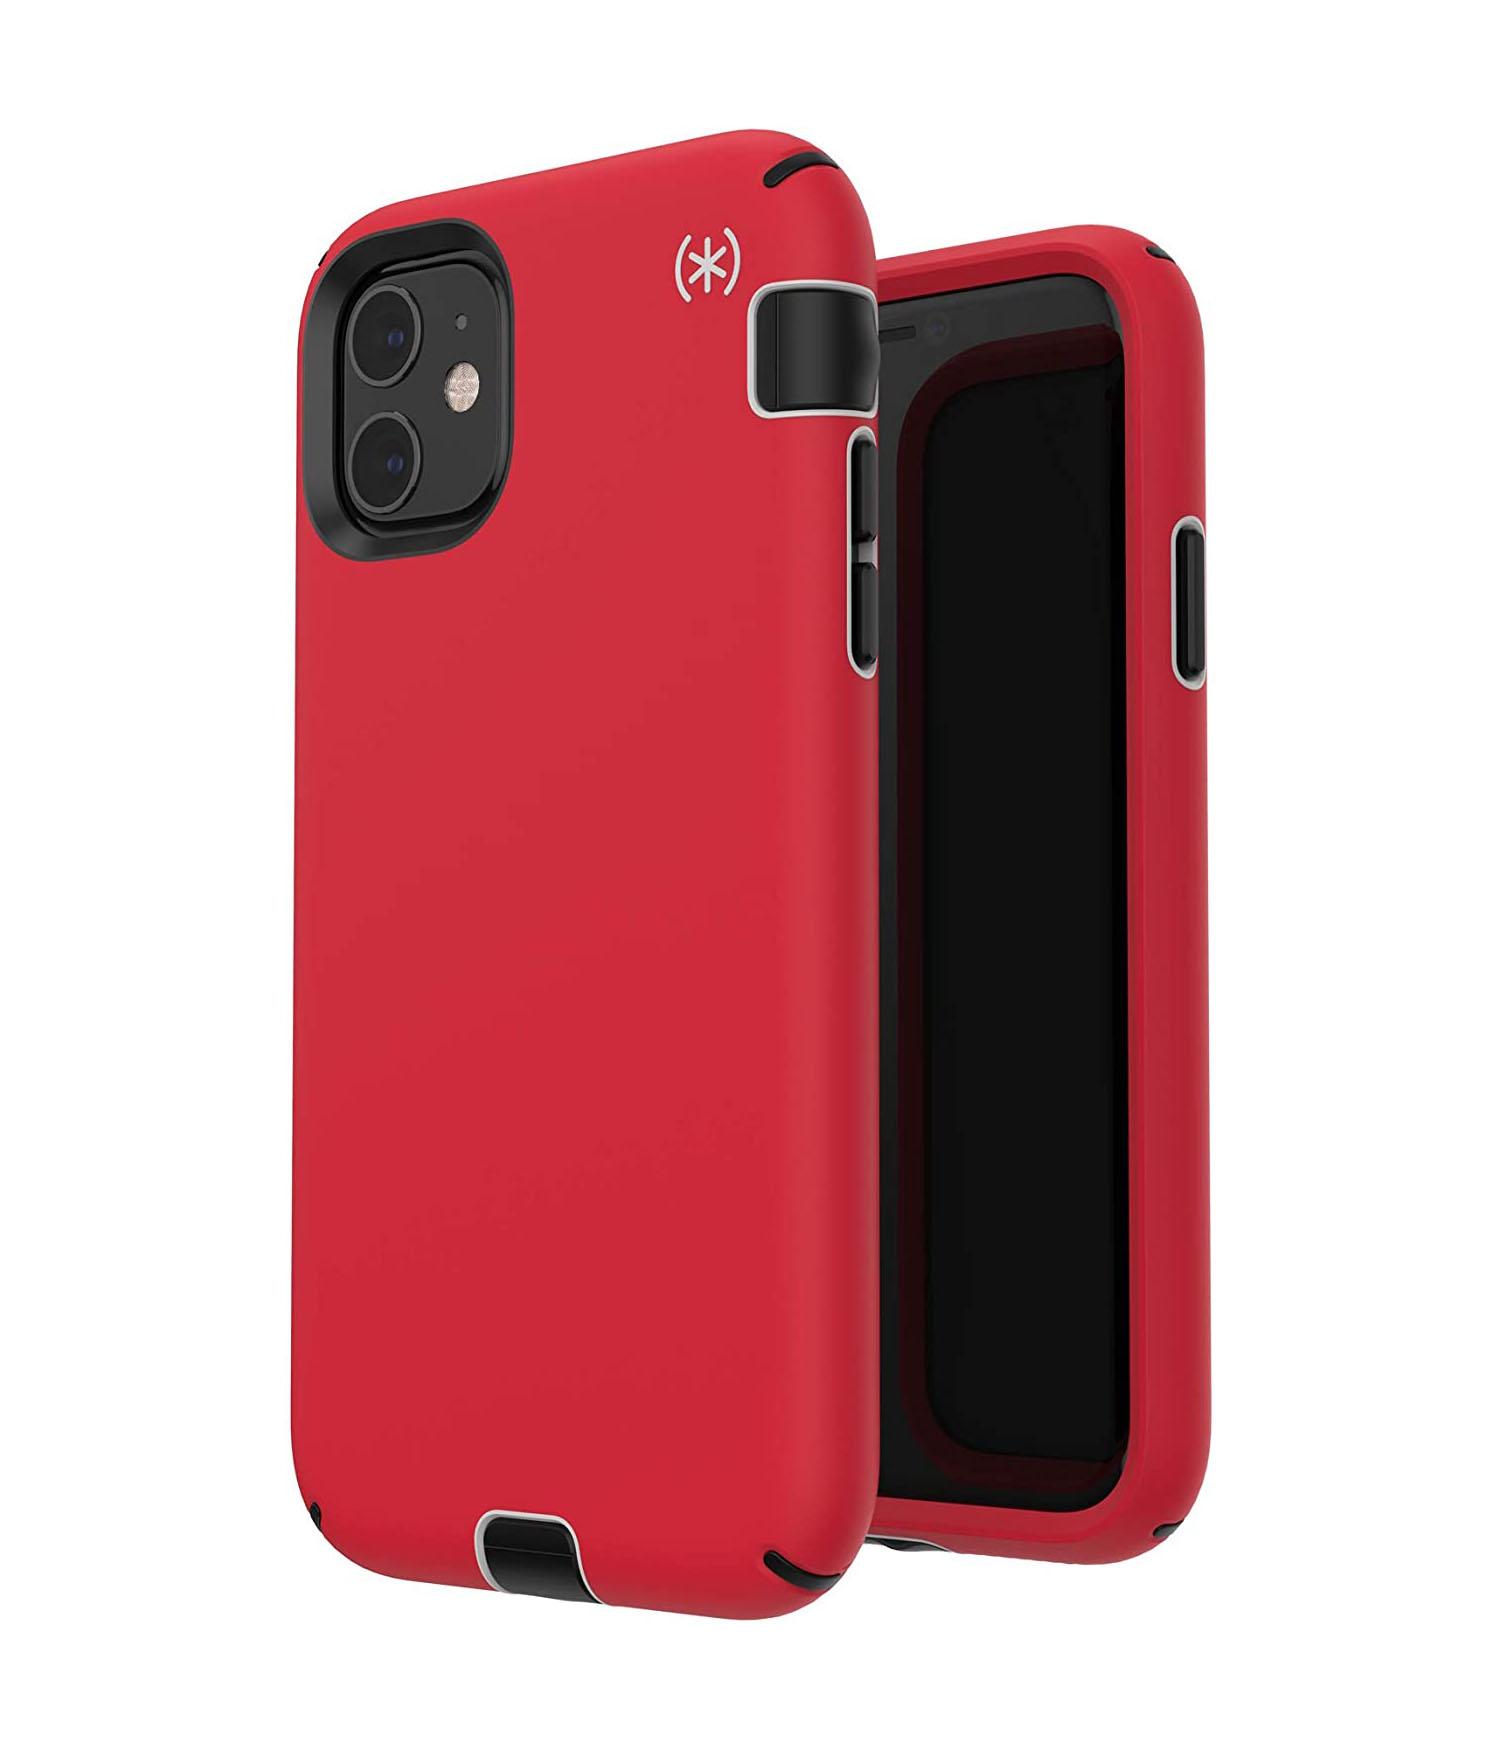 Speck Presidio Sport Case for iPhone 11 - Heartrate Red/Sidewalk Grey/Black